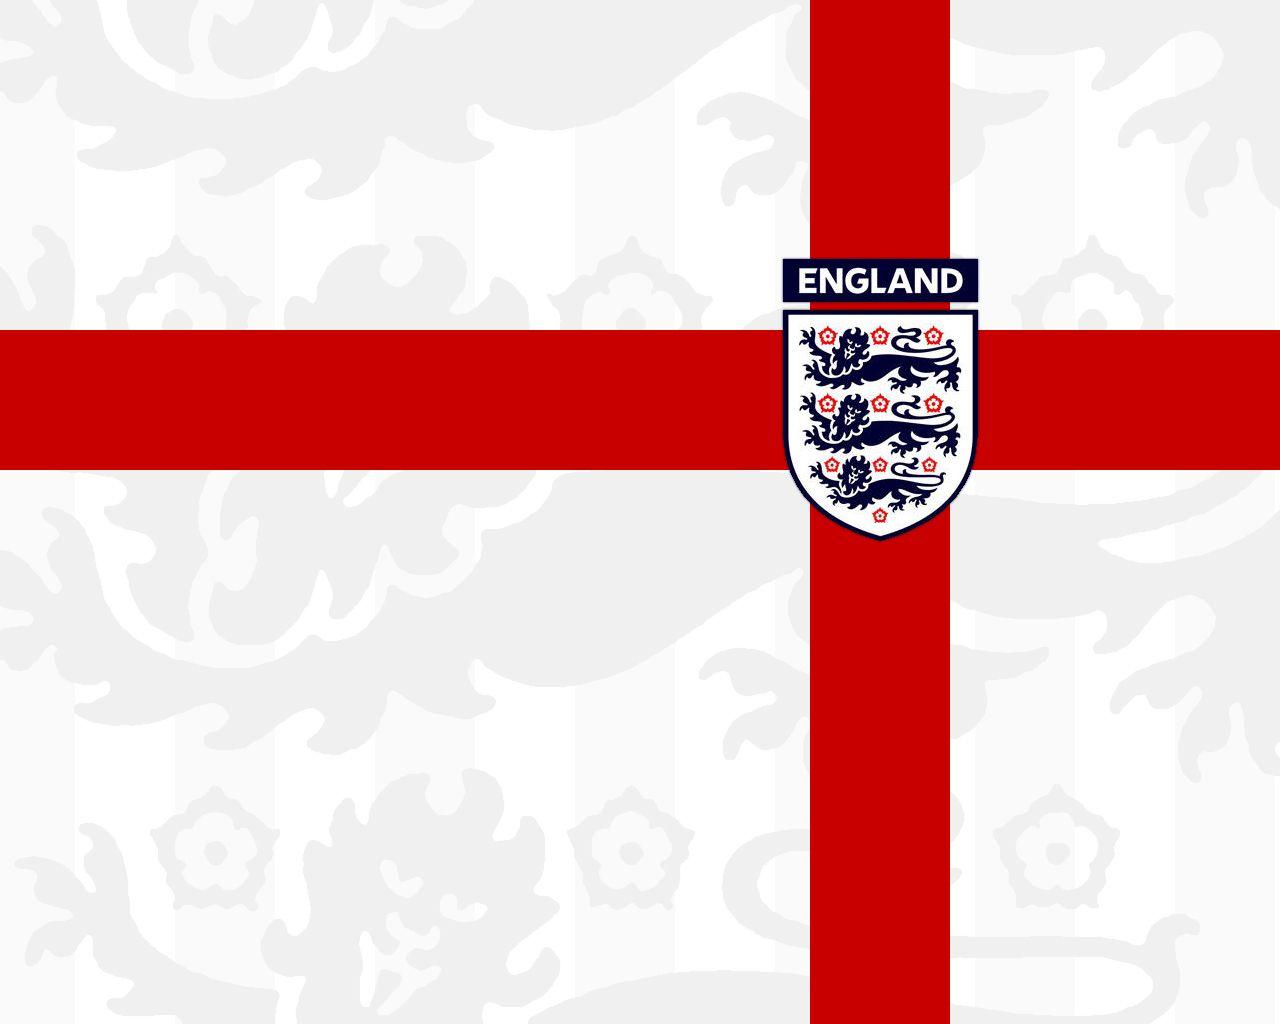 England National Team Sports Favorites England Football England